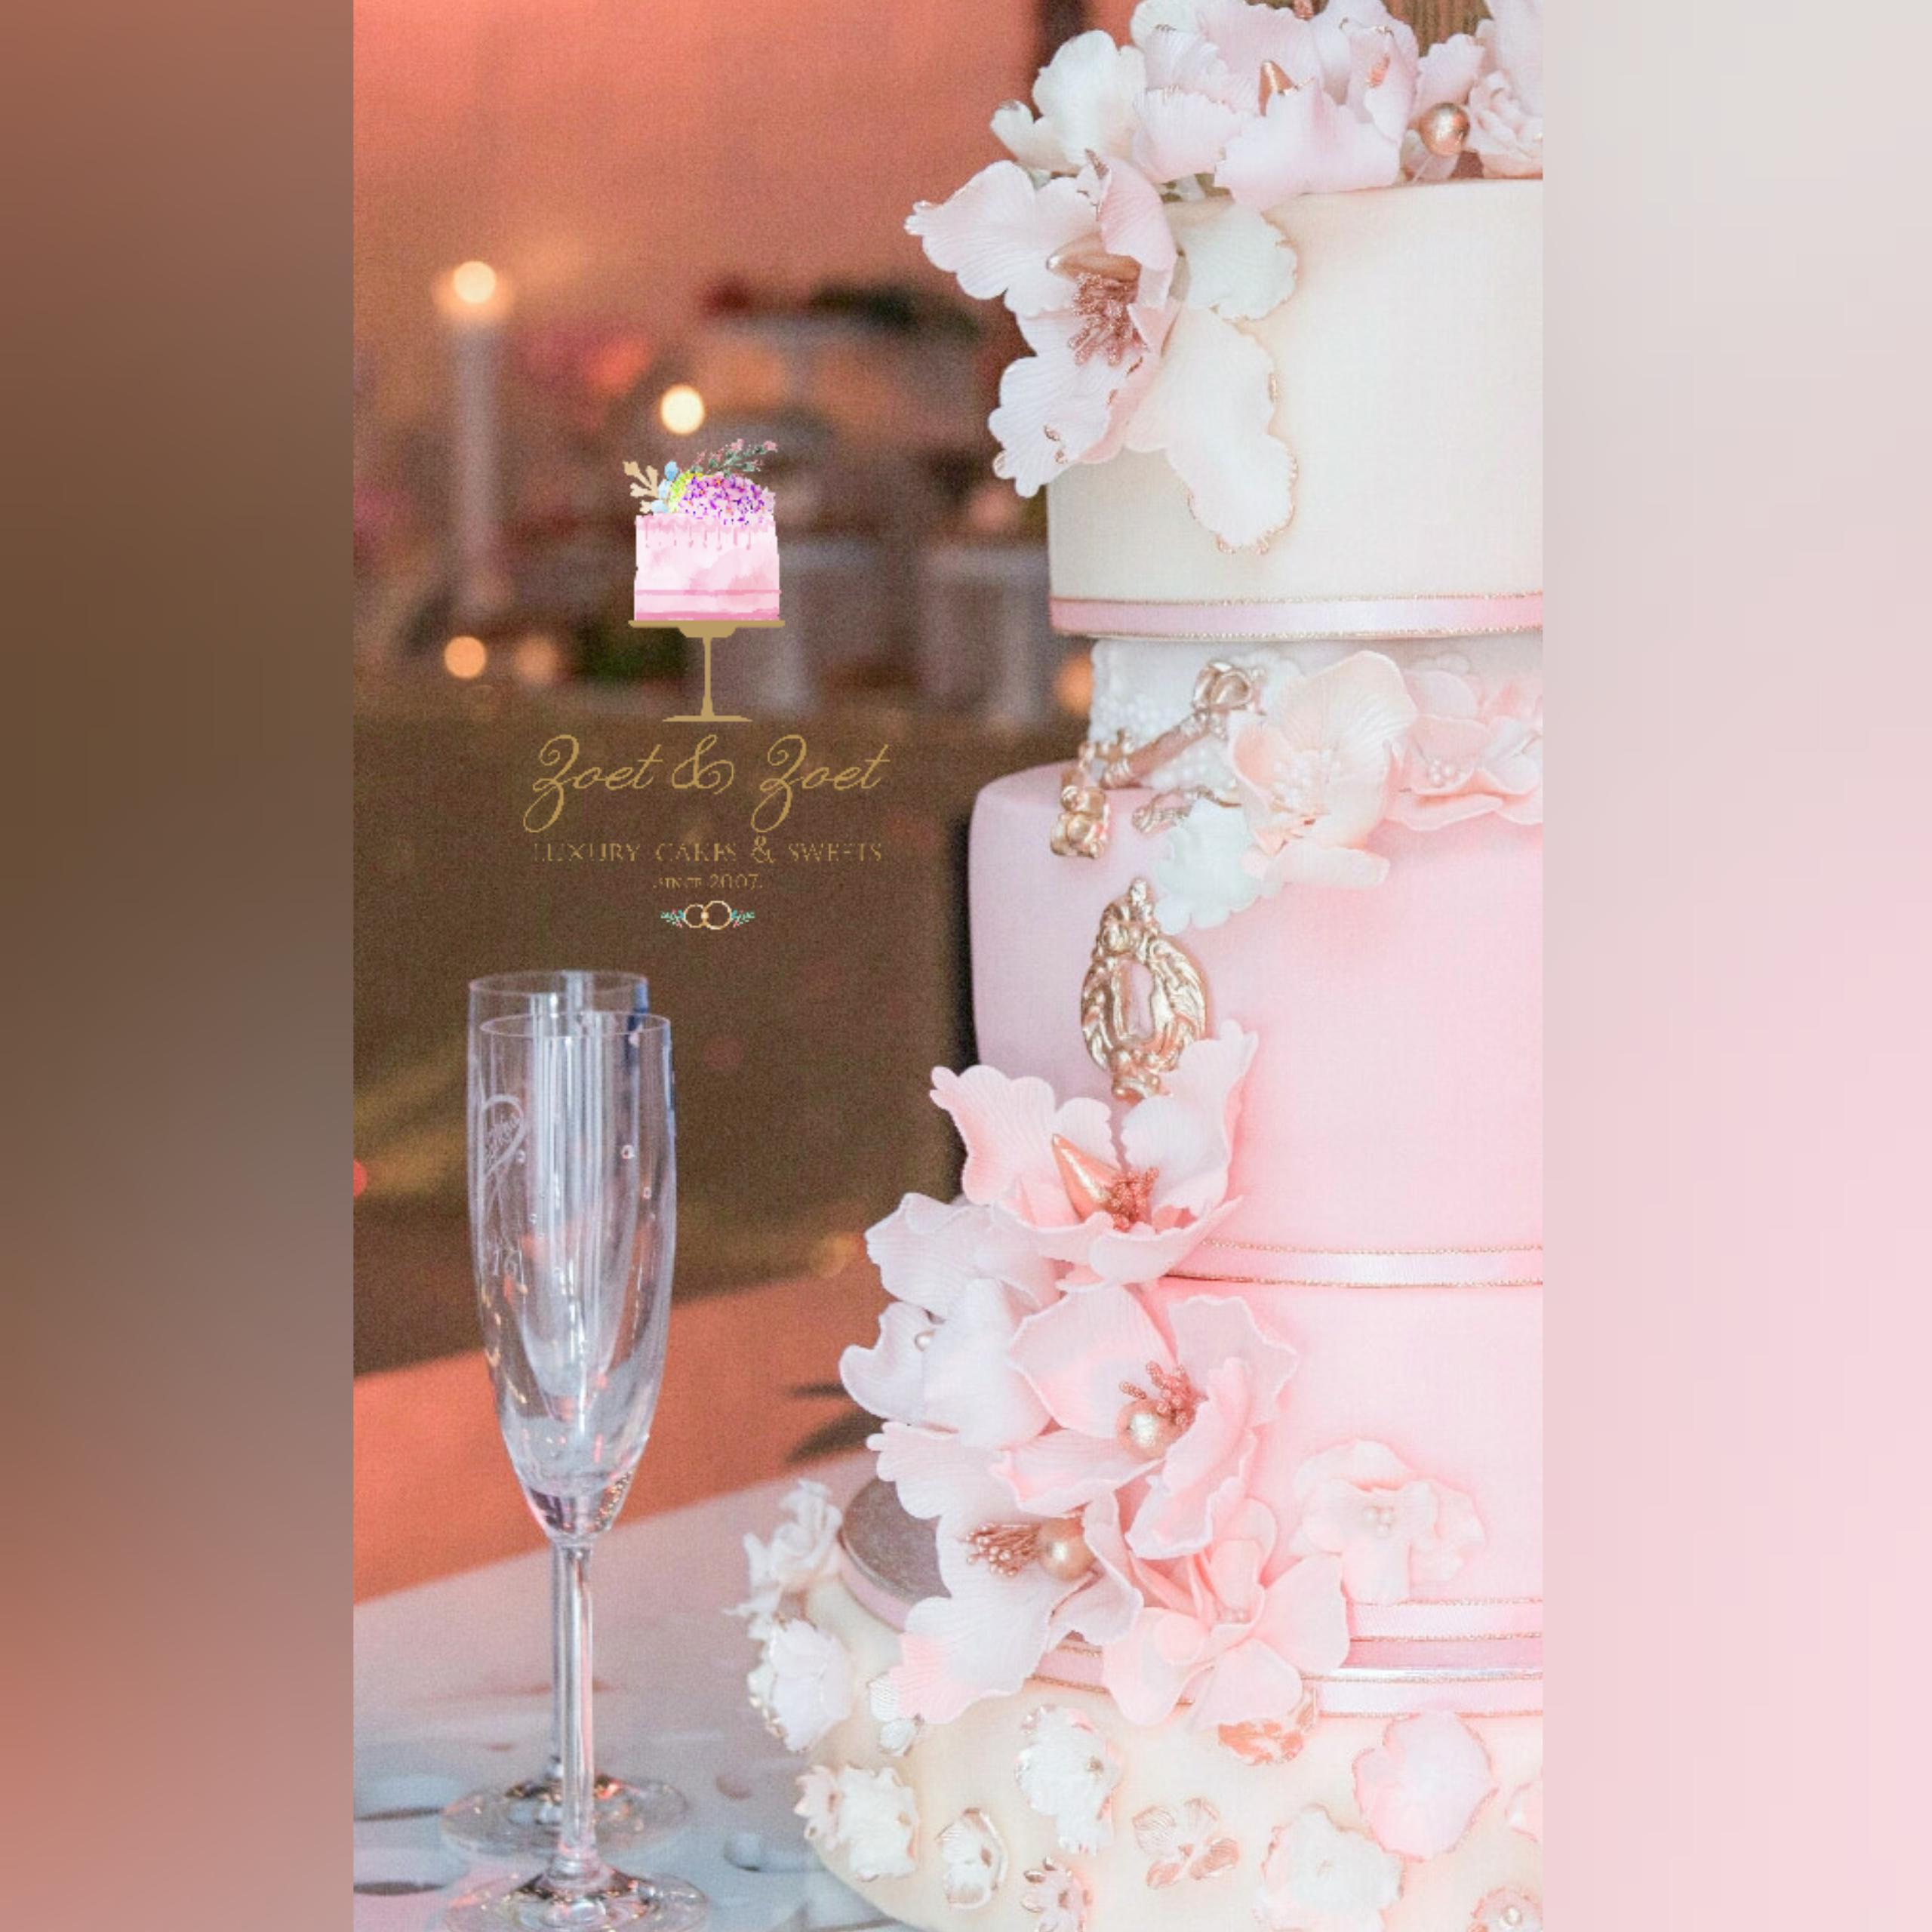 Pink and White Victorian flower wedding